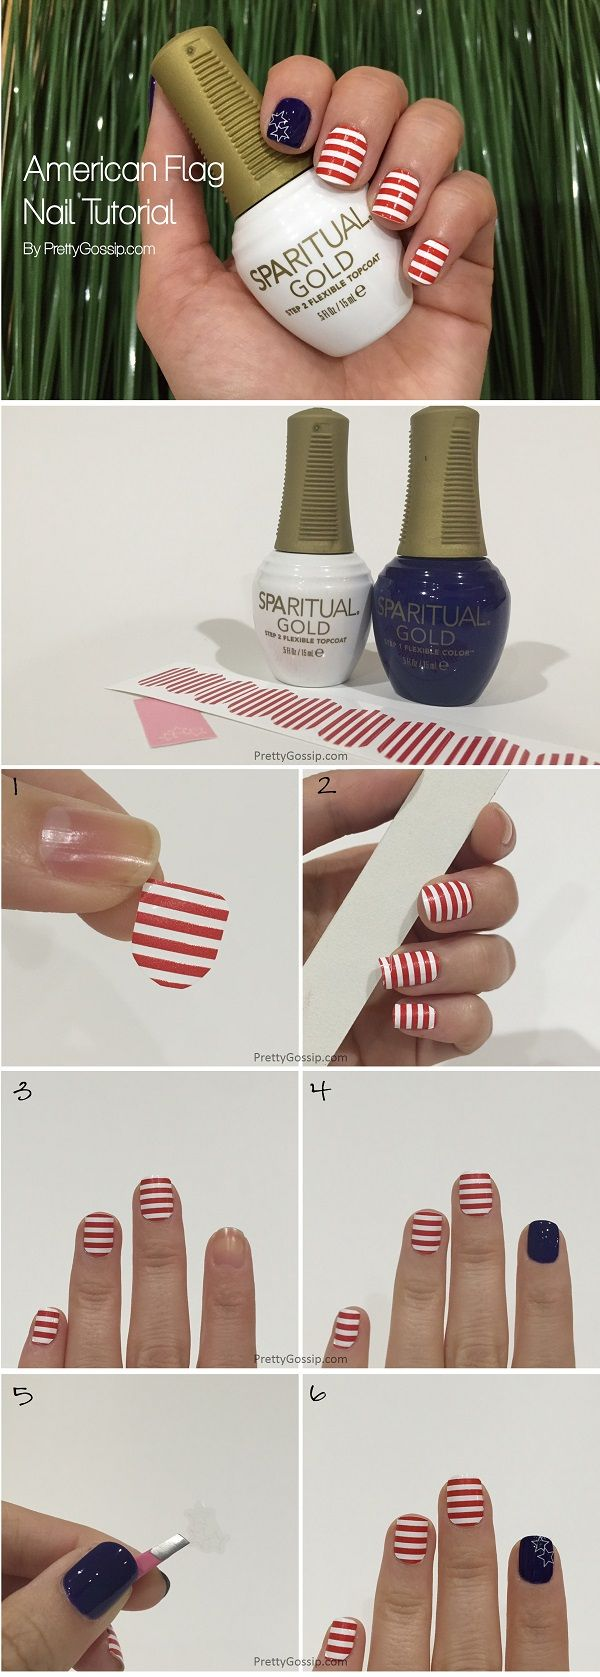 #American Flag Nail by #PrettyGossip. #NOTD #Nails #NailLook